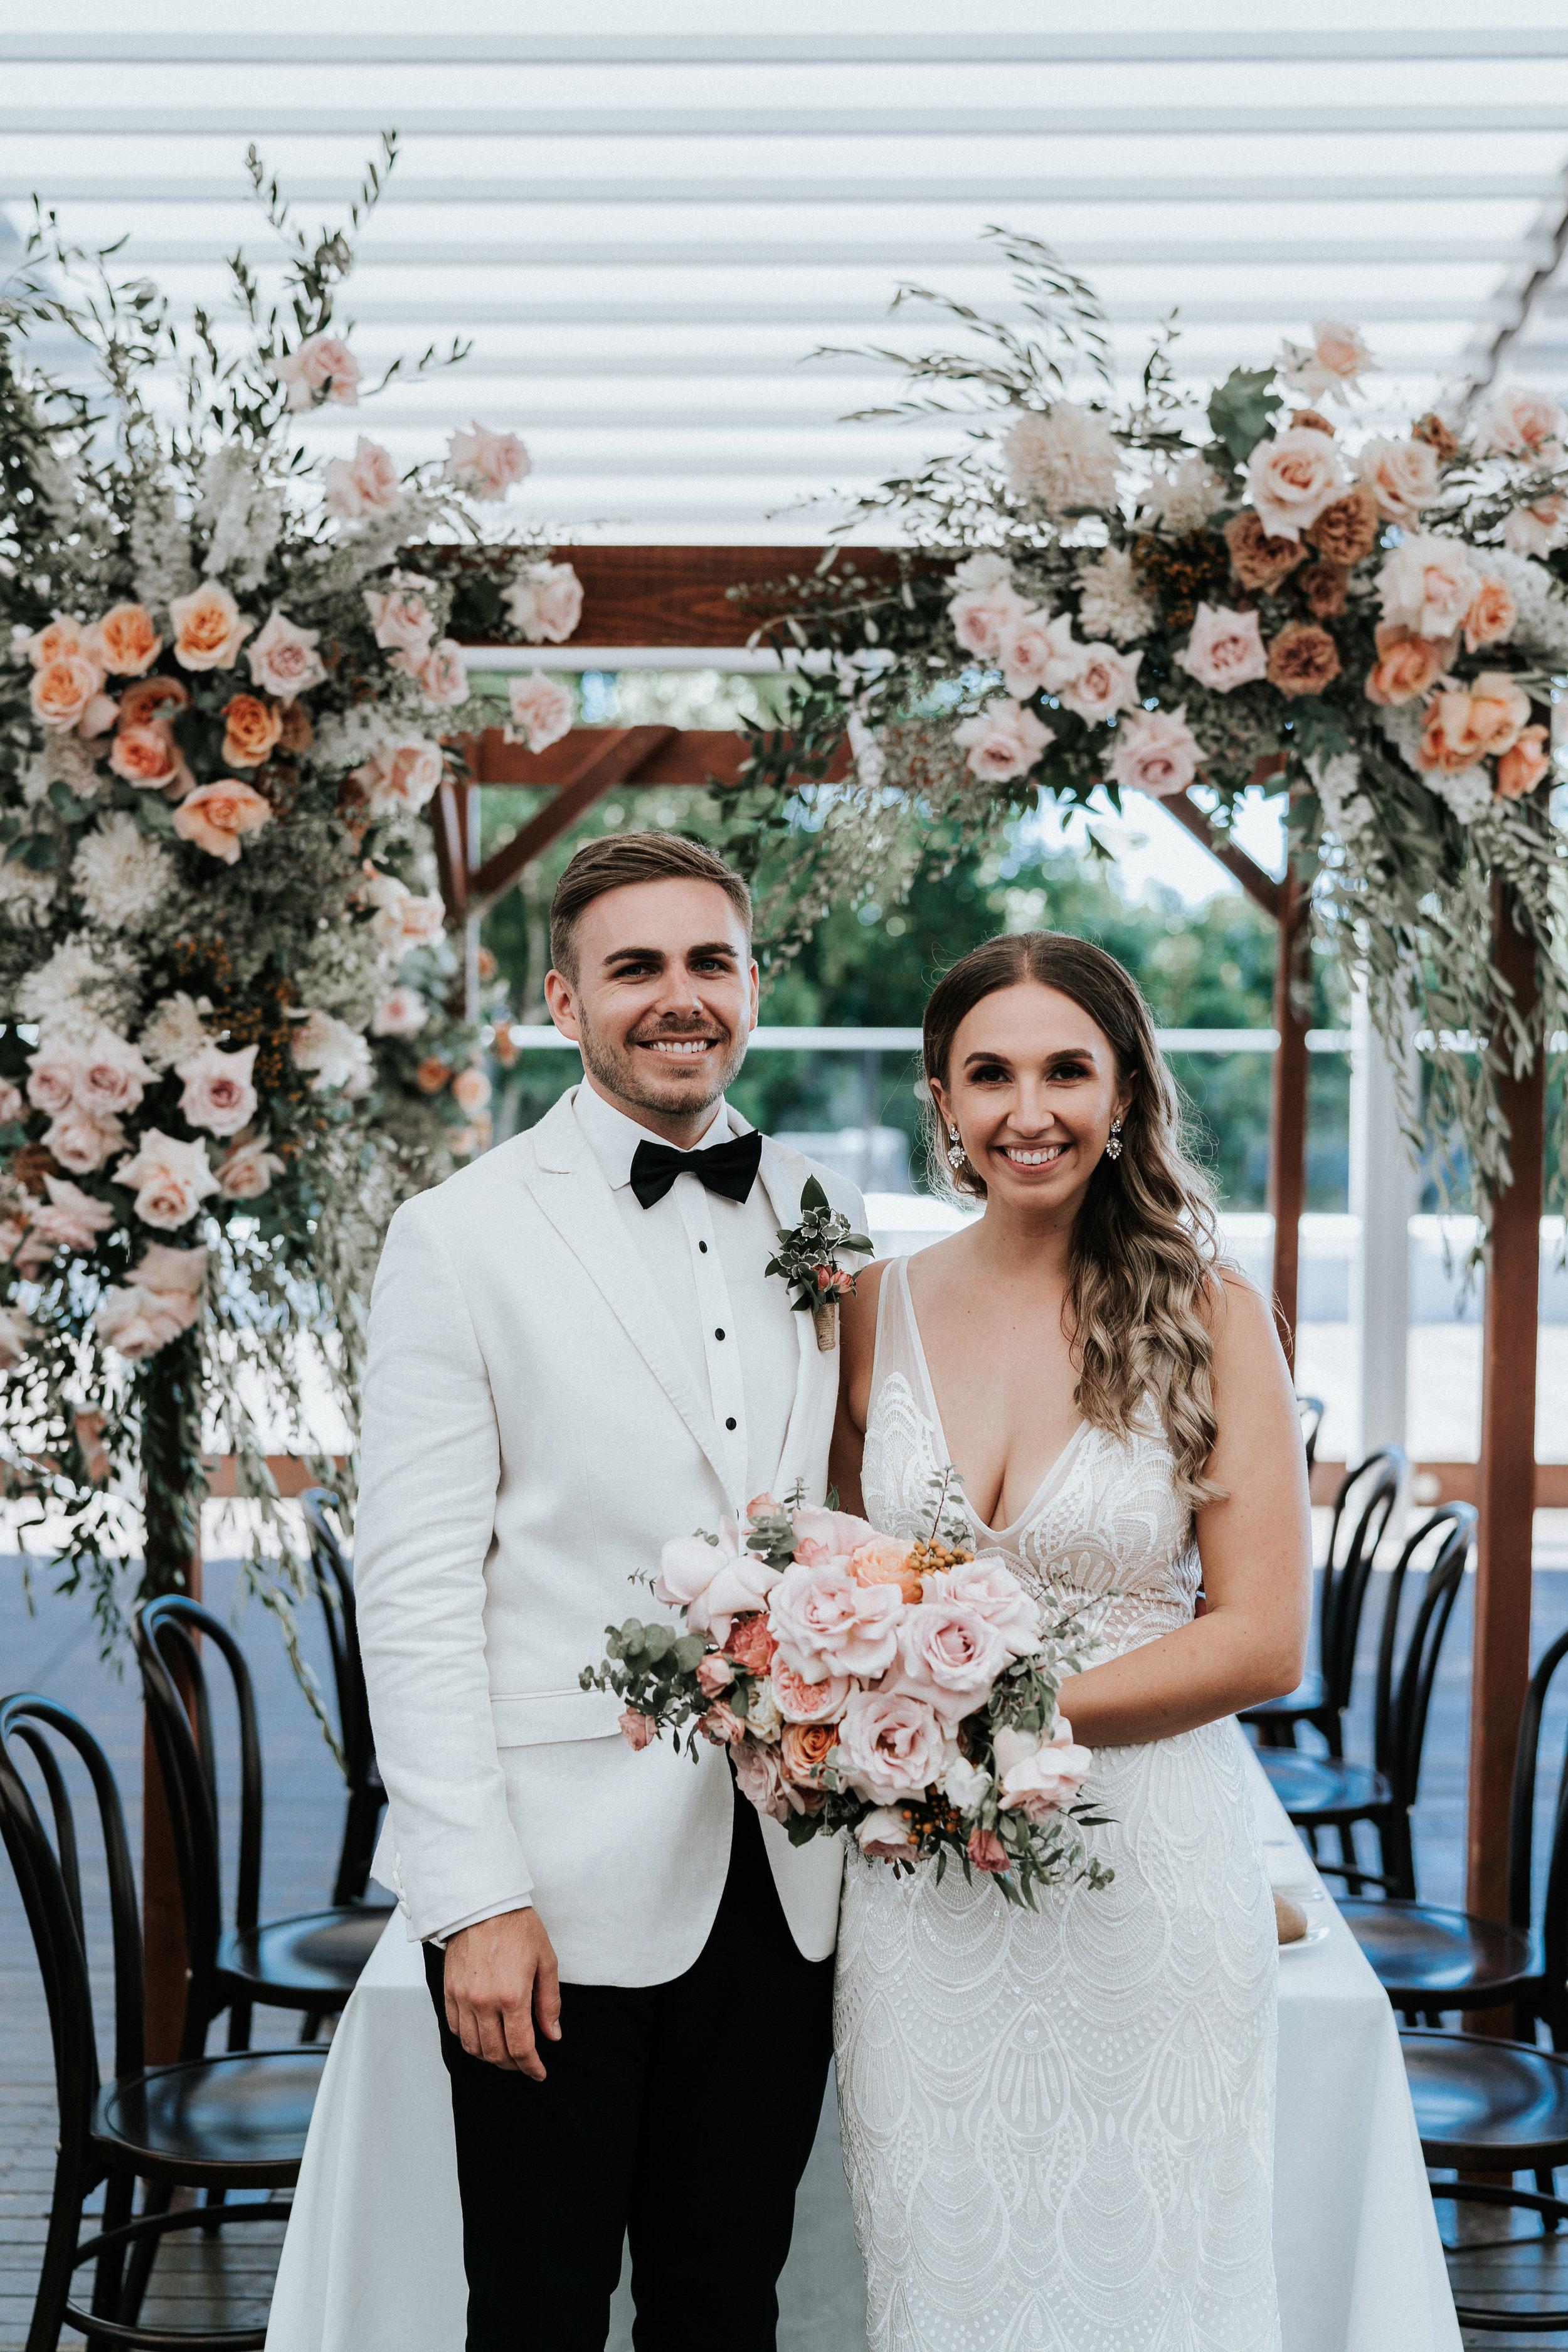 michelle-jonathon-harley-wedding-697.jpg